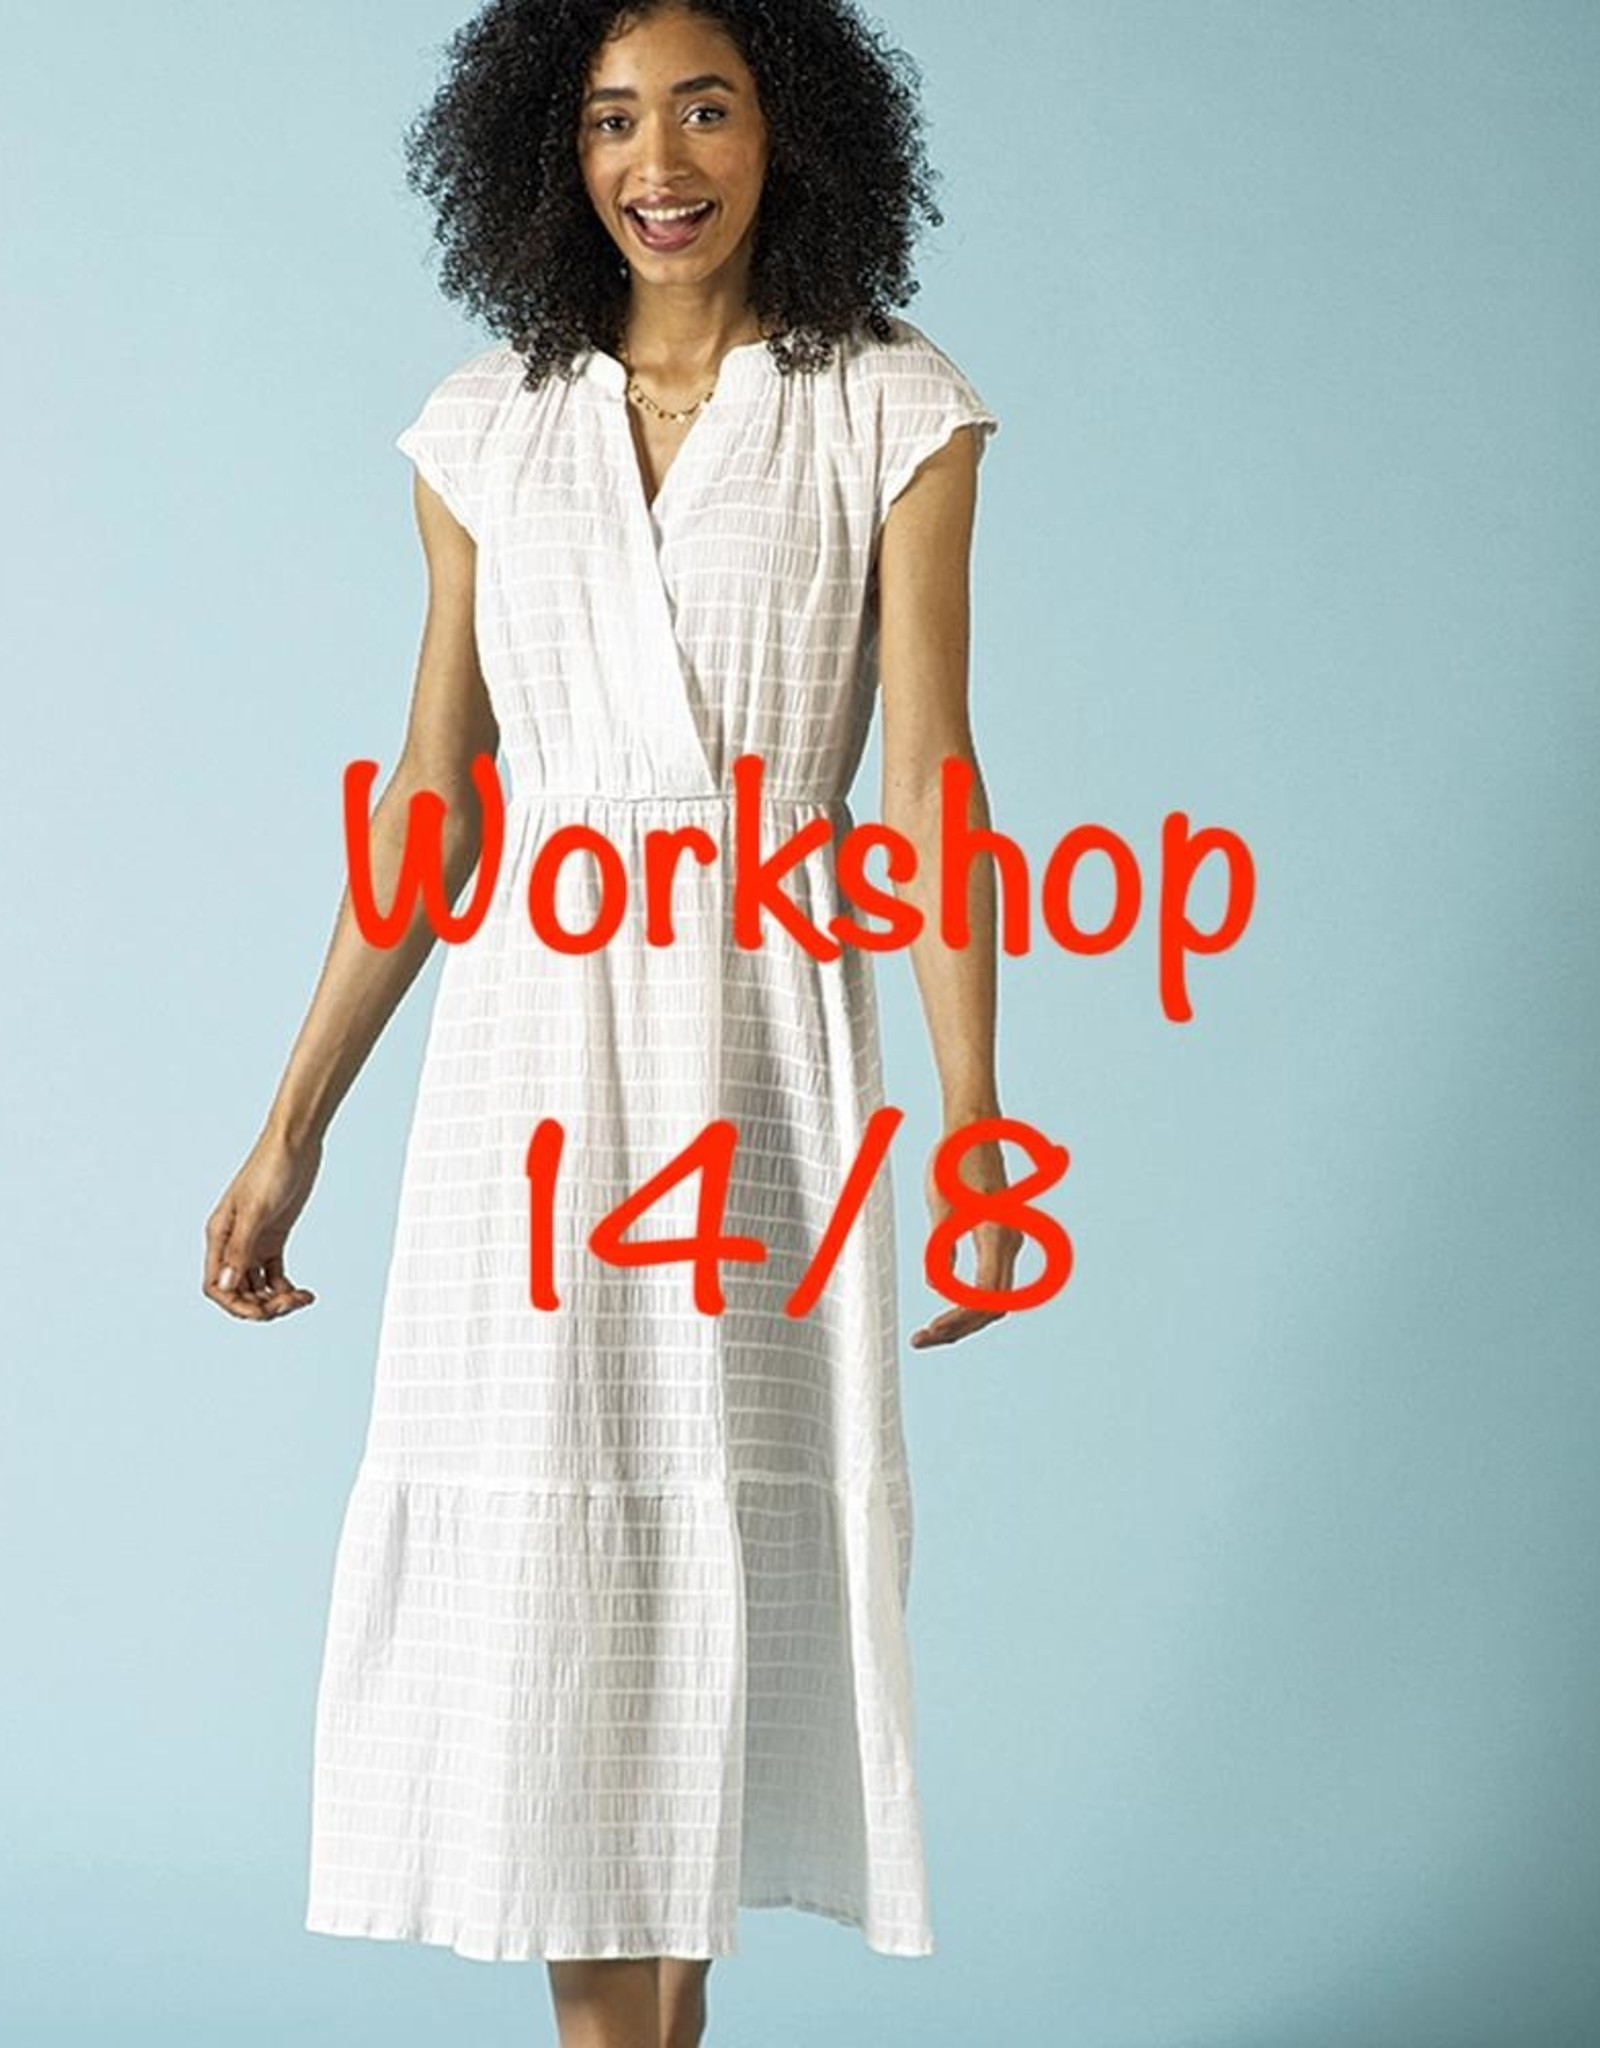 Workshop Crisa jurk 14/8